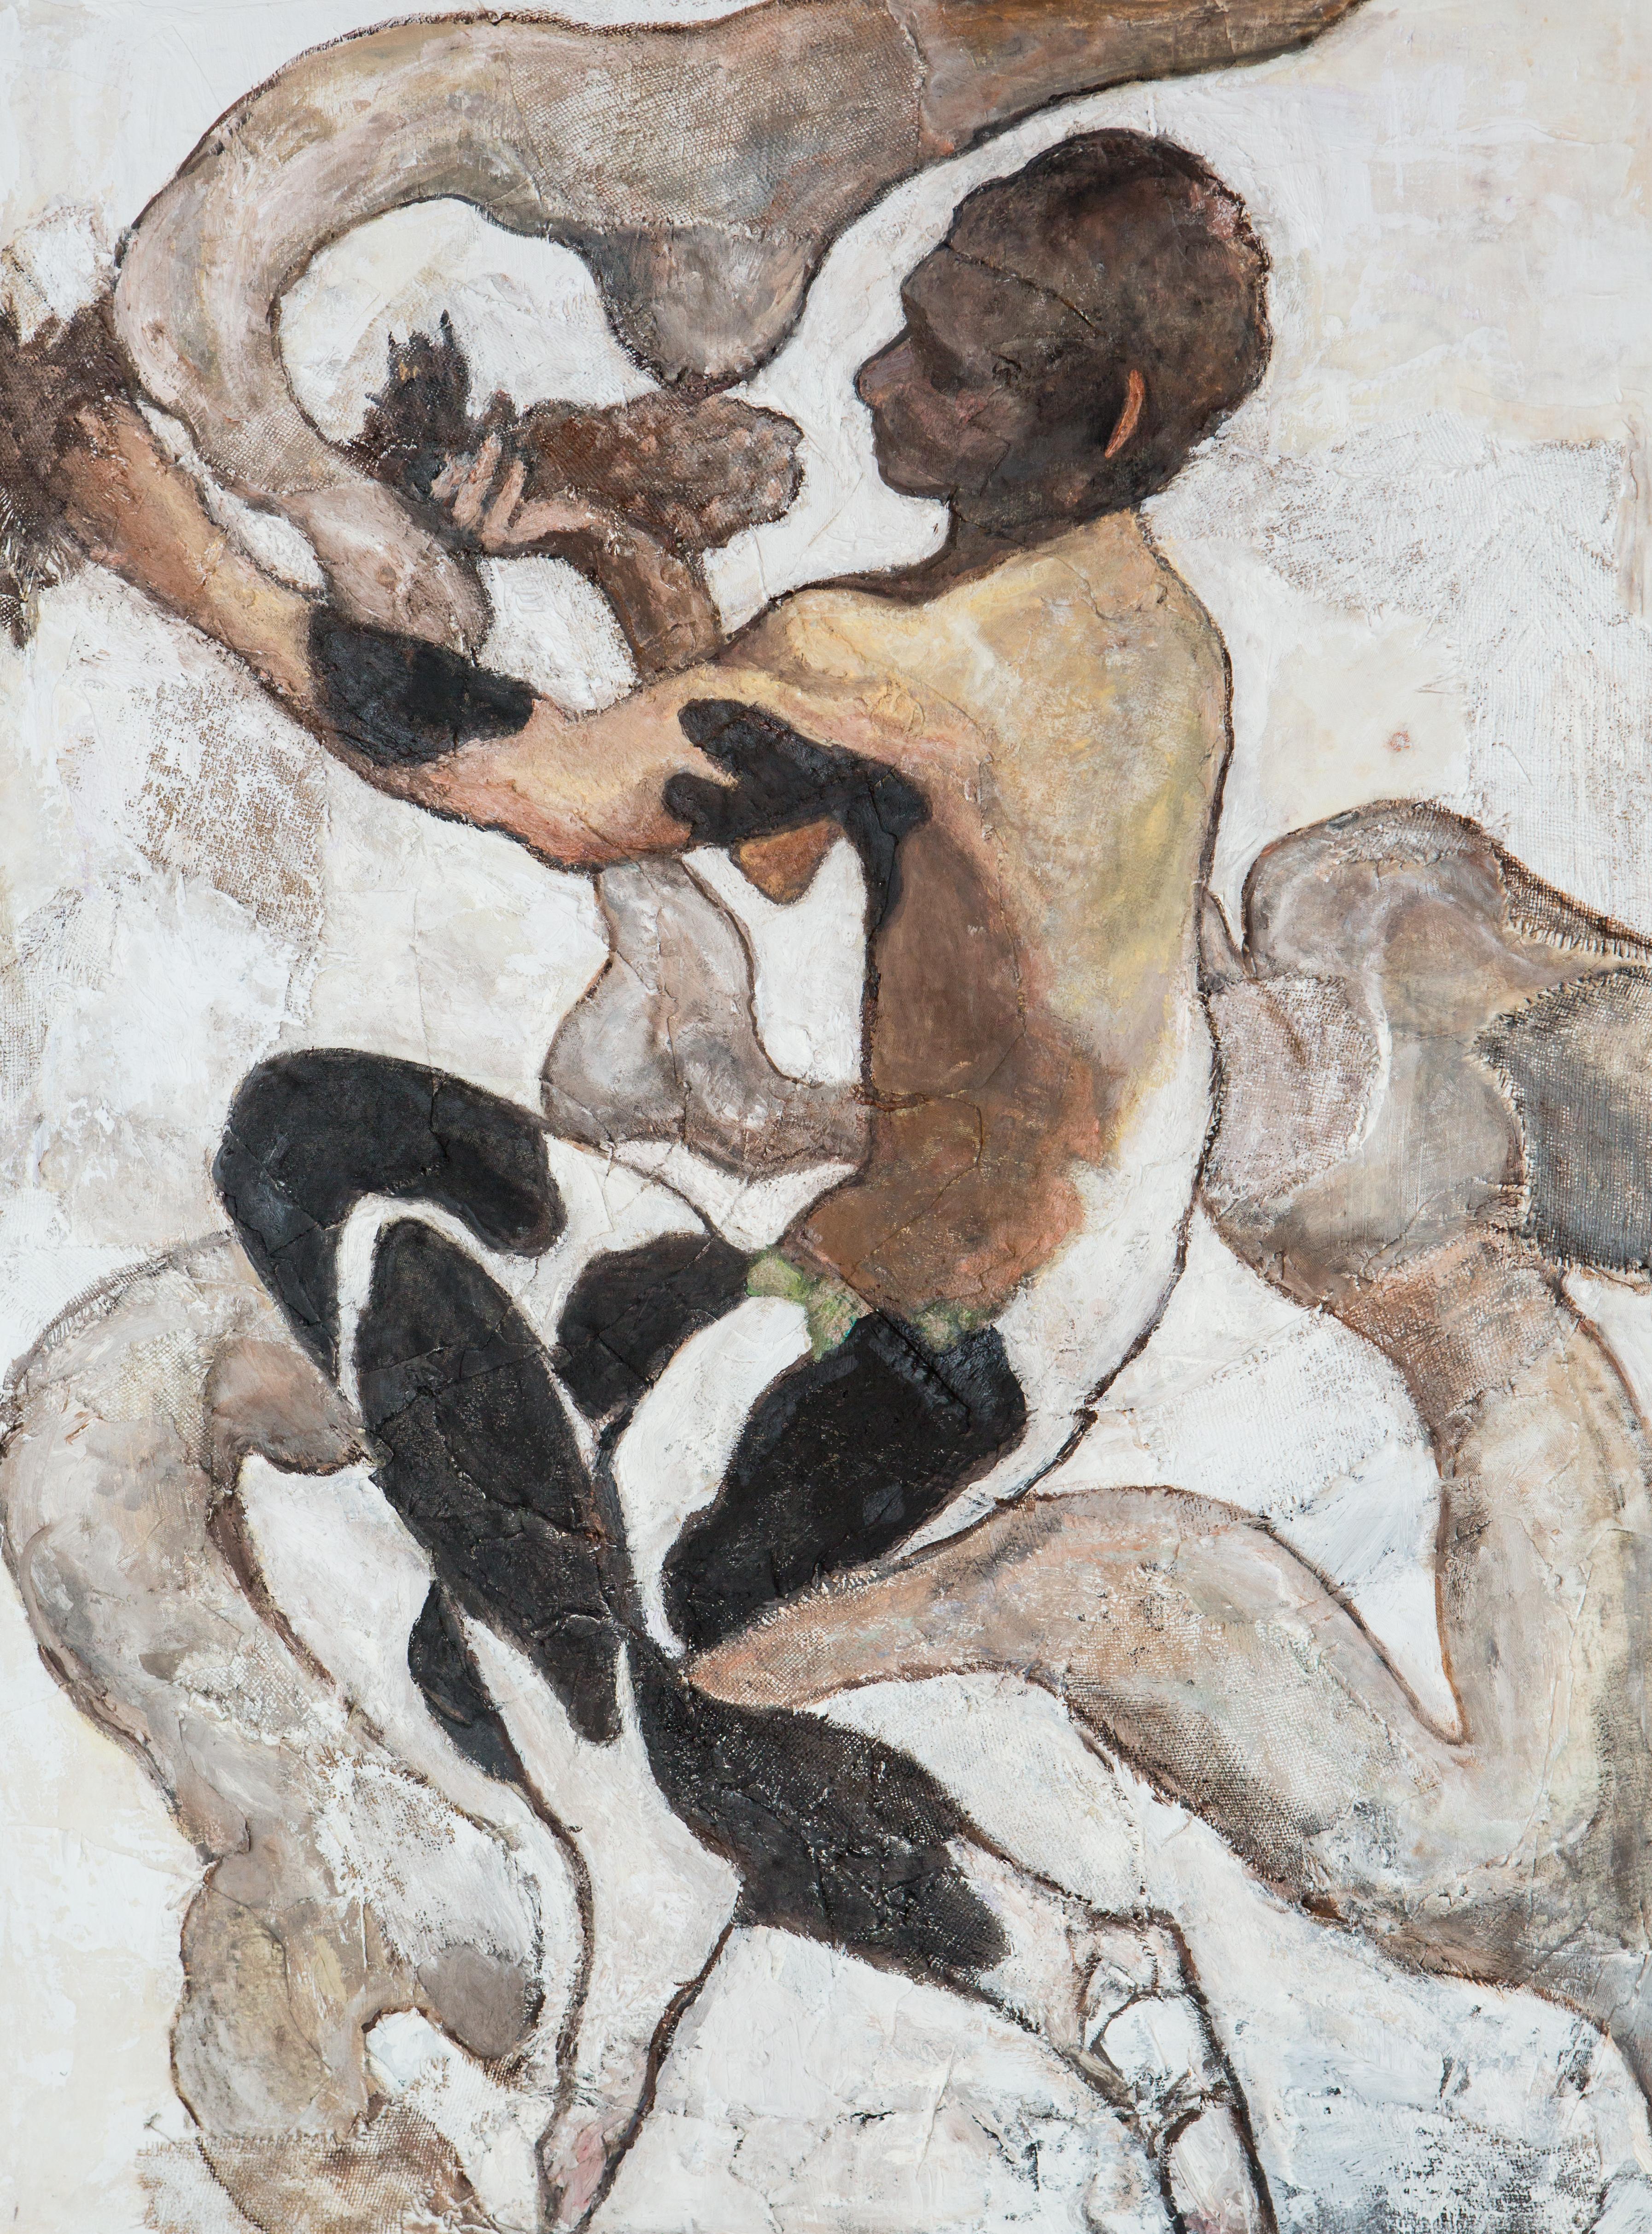 RACHAEL-ISADORA-03.12.16-0011